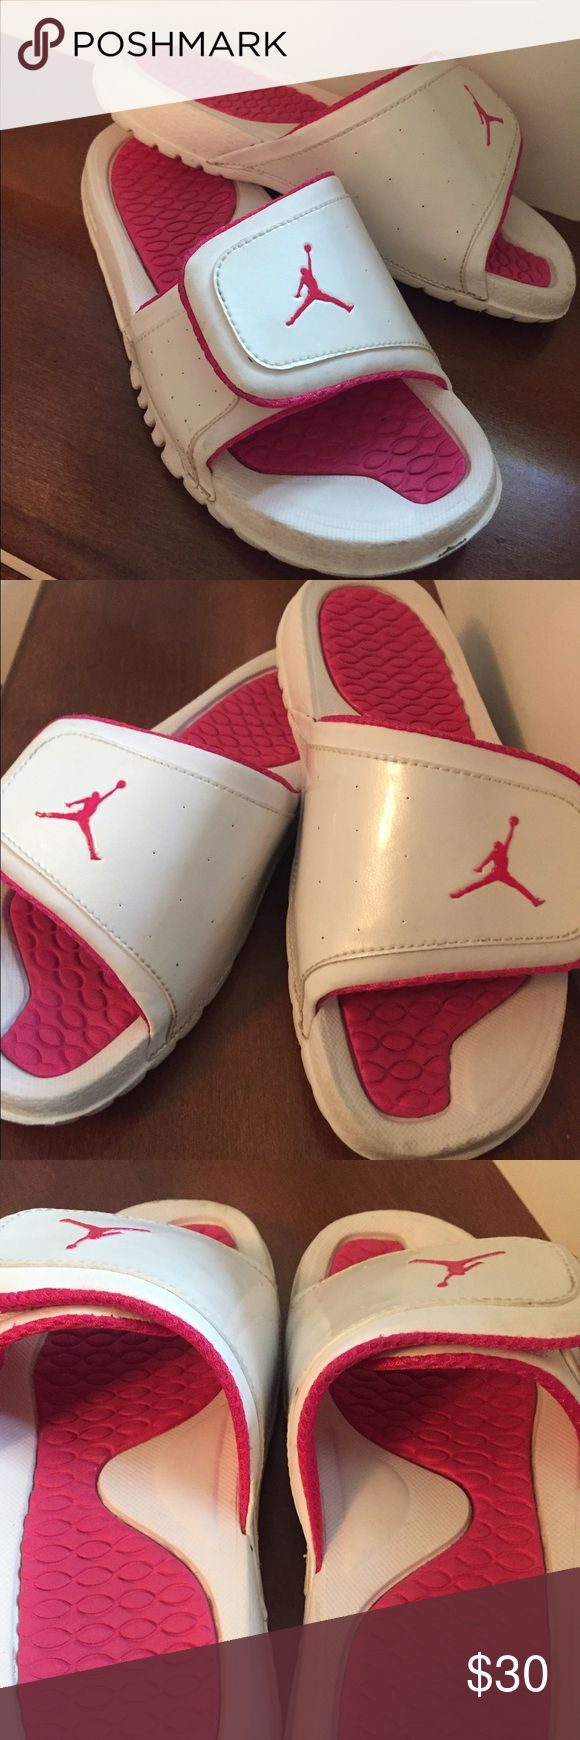 Girls pink and white Jordan Slides In perfect condition! Hardly worn! Jordan Shoes Sandals & Flip Flops